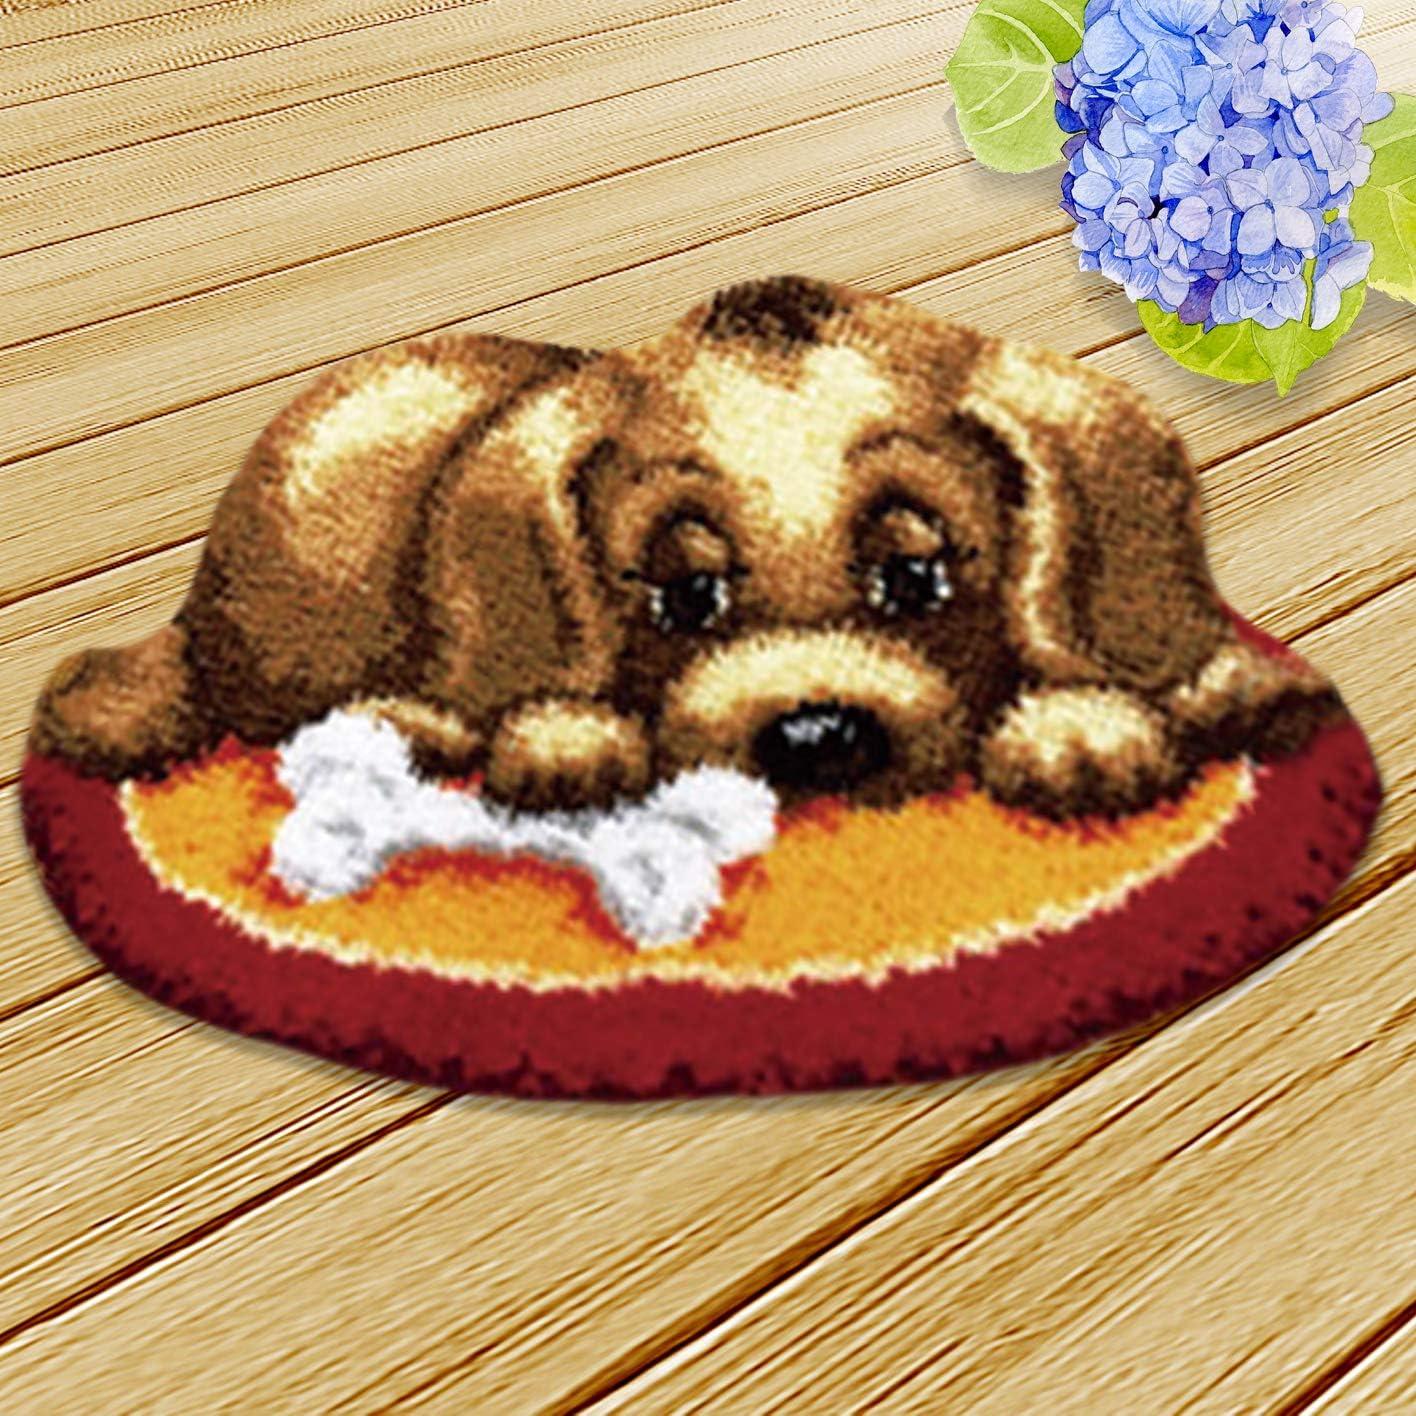 Needlework Unfinished Rug,1 Set Onebook Animal Pattern Carpet Cushion Latch Hook Kits with Basic Tools DIY Home Ornaments,Making Latch Hooking Kit,Dog Latch Hook Kits